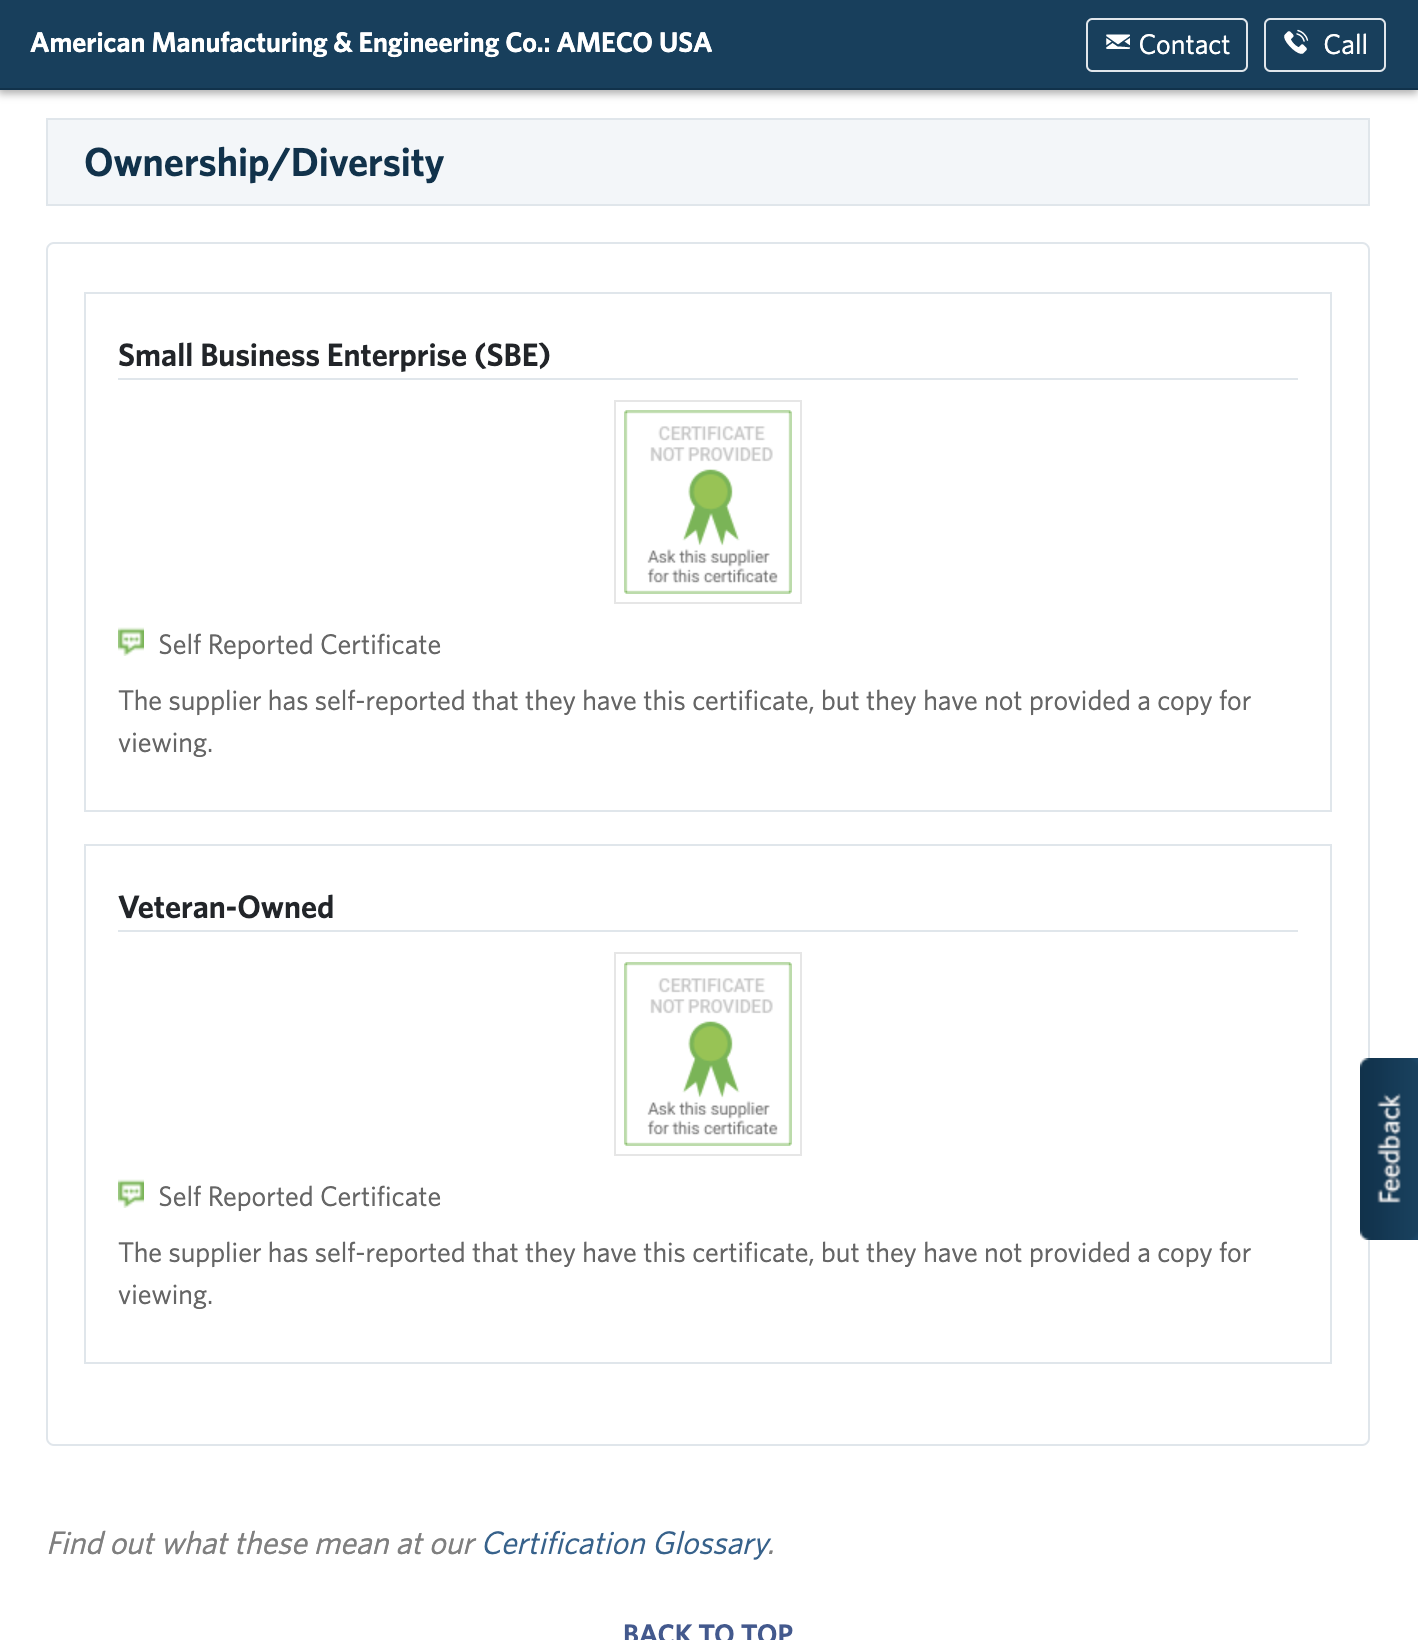 AMECO Ownership & Diversity